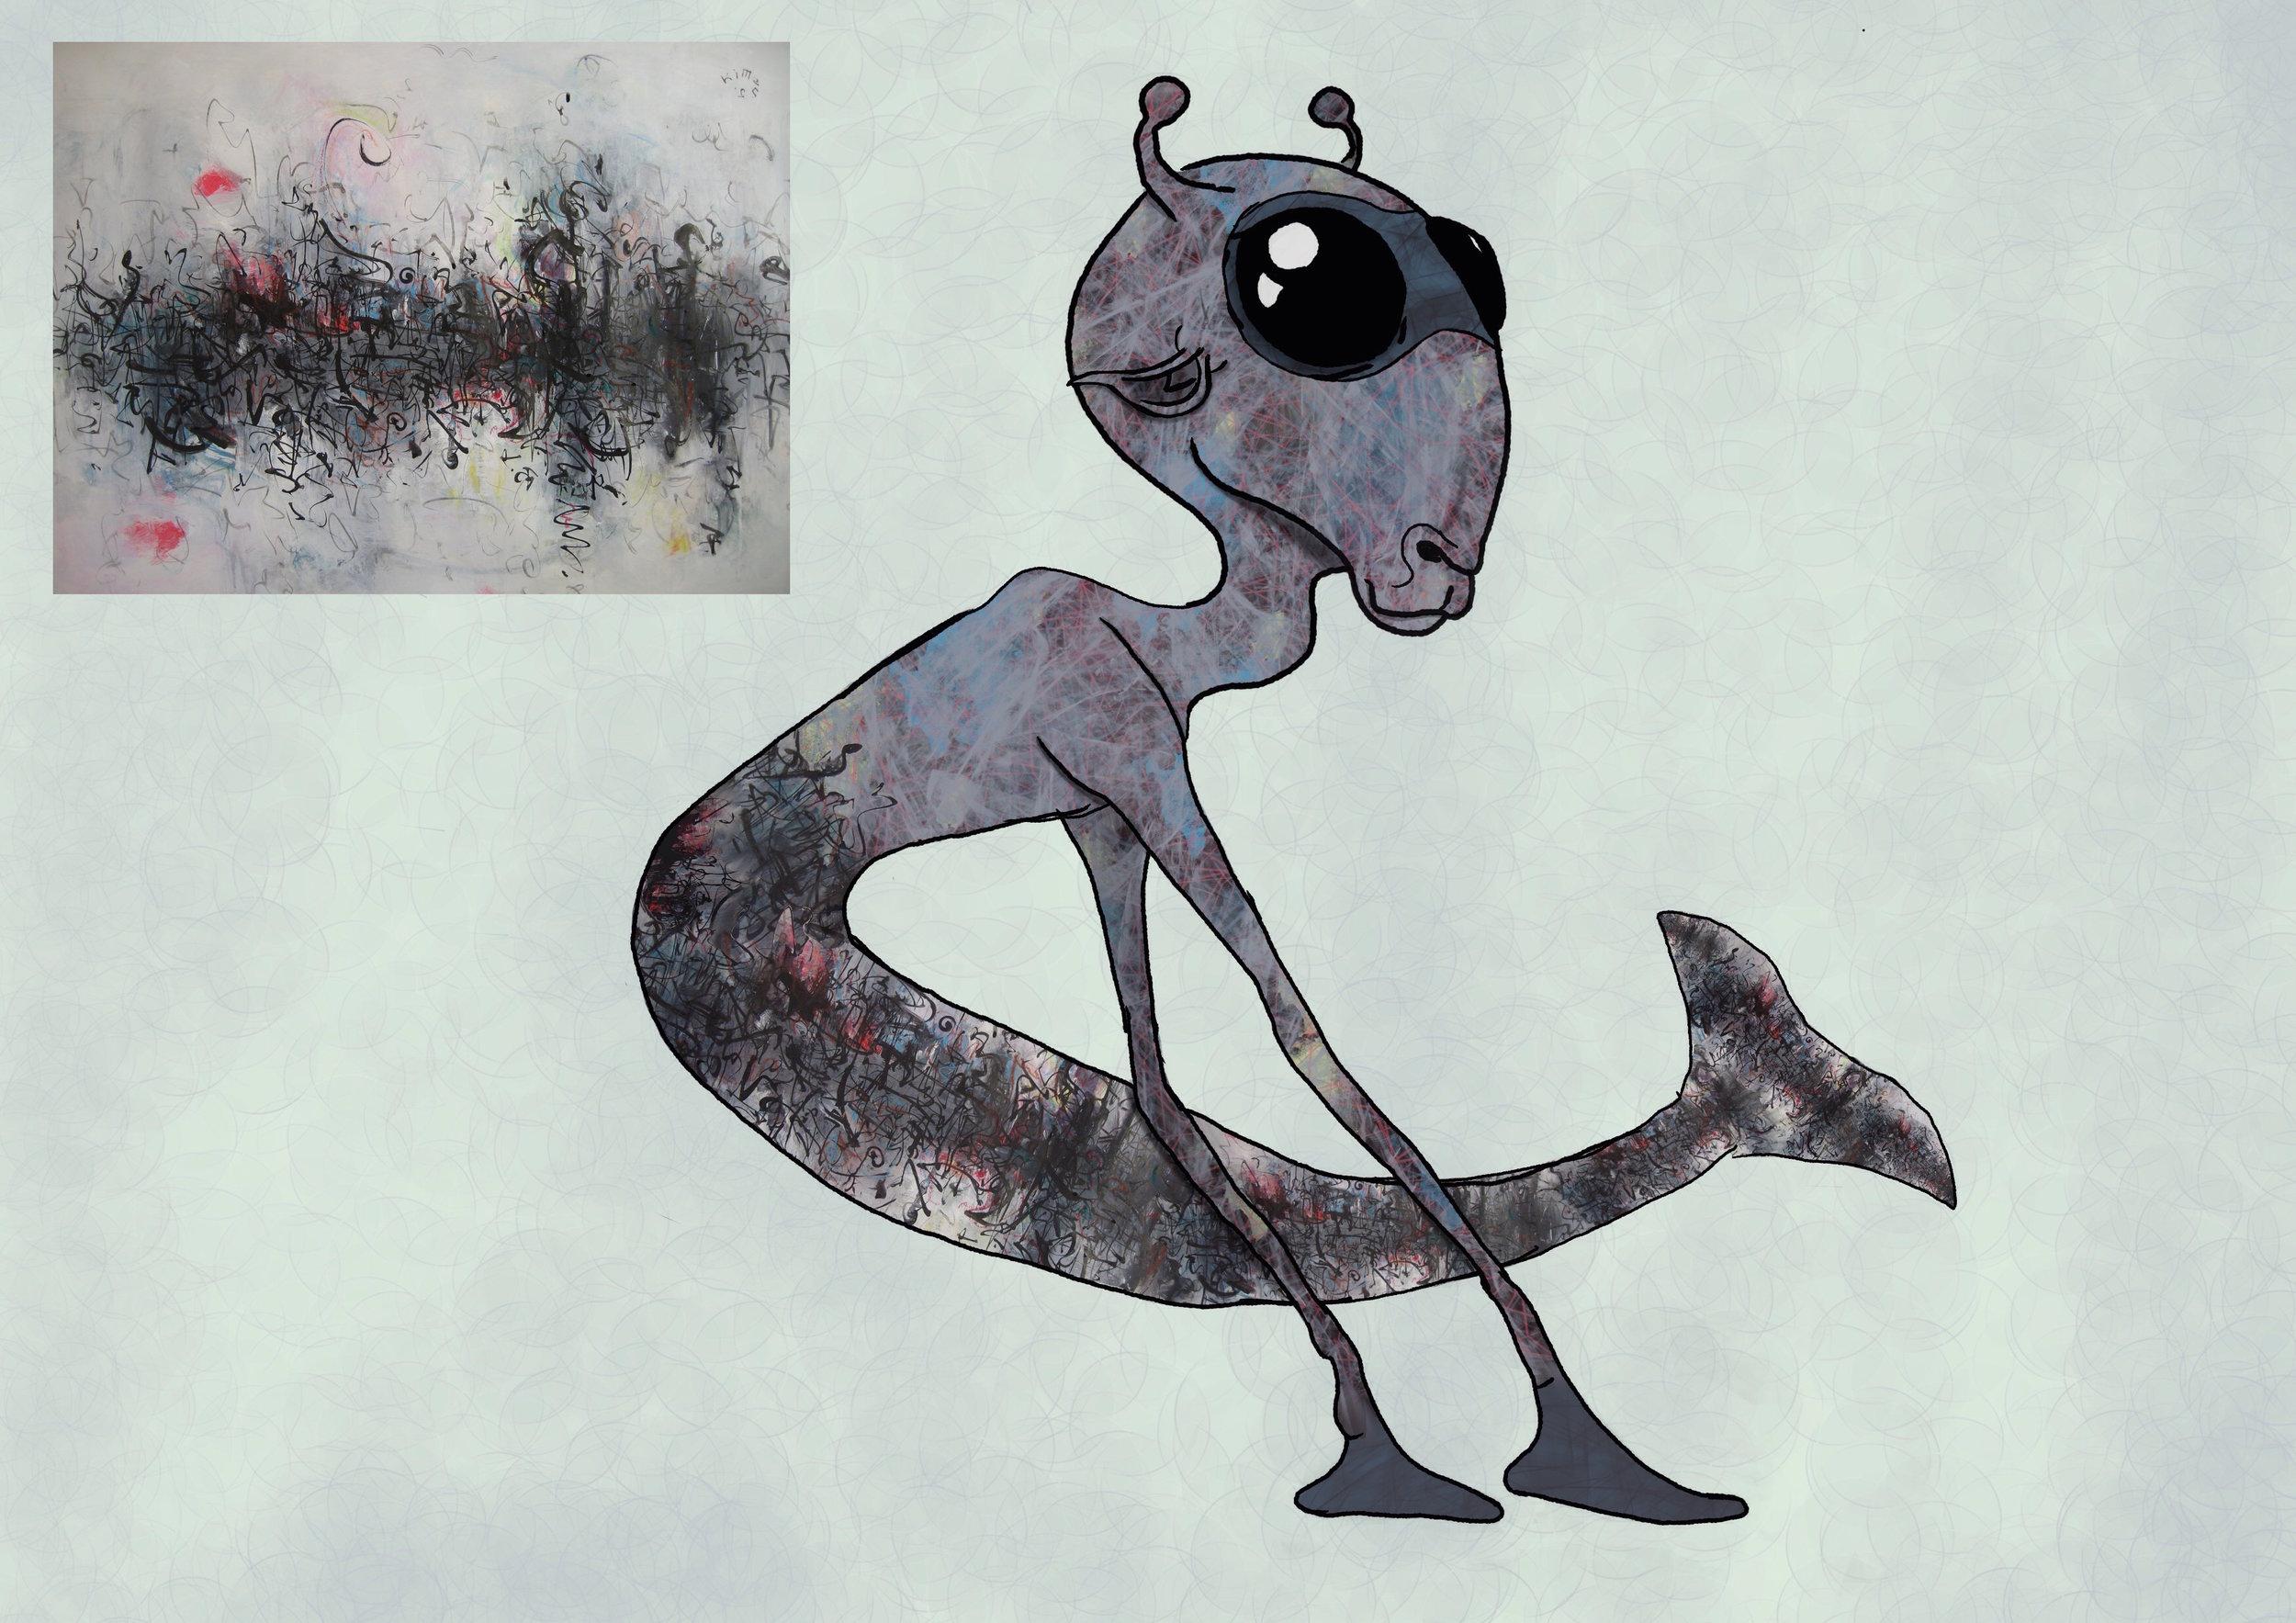 Abstract Art Alien Design